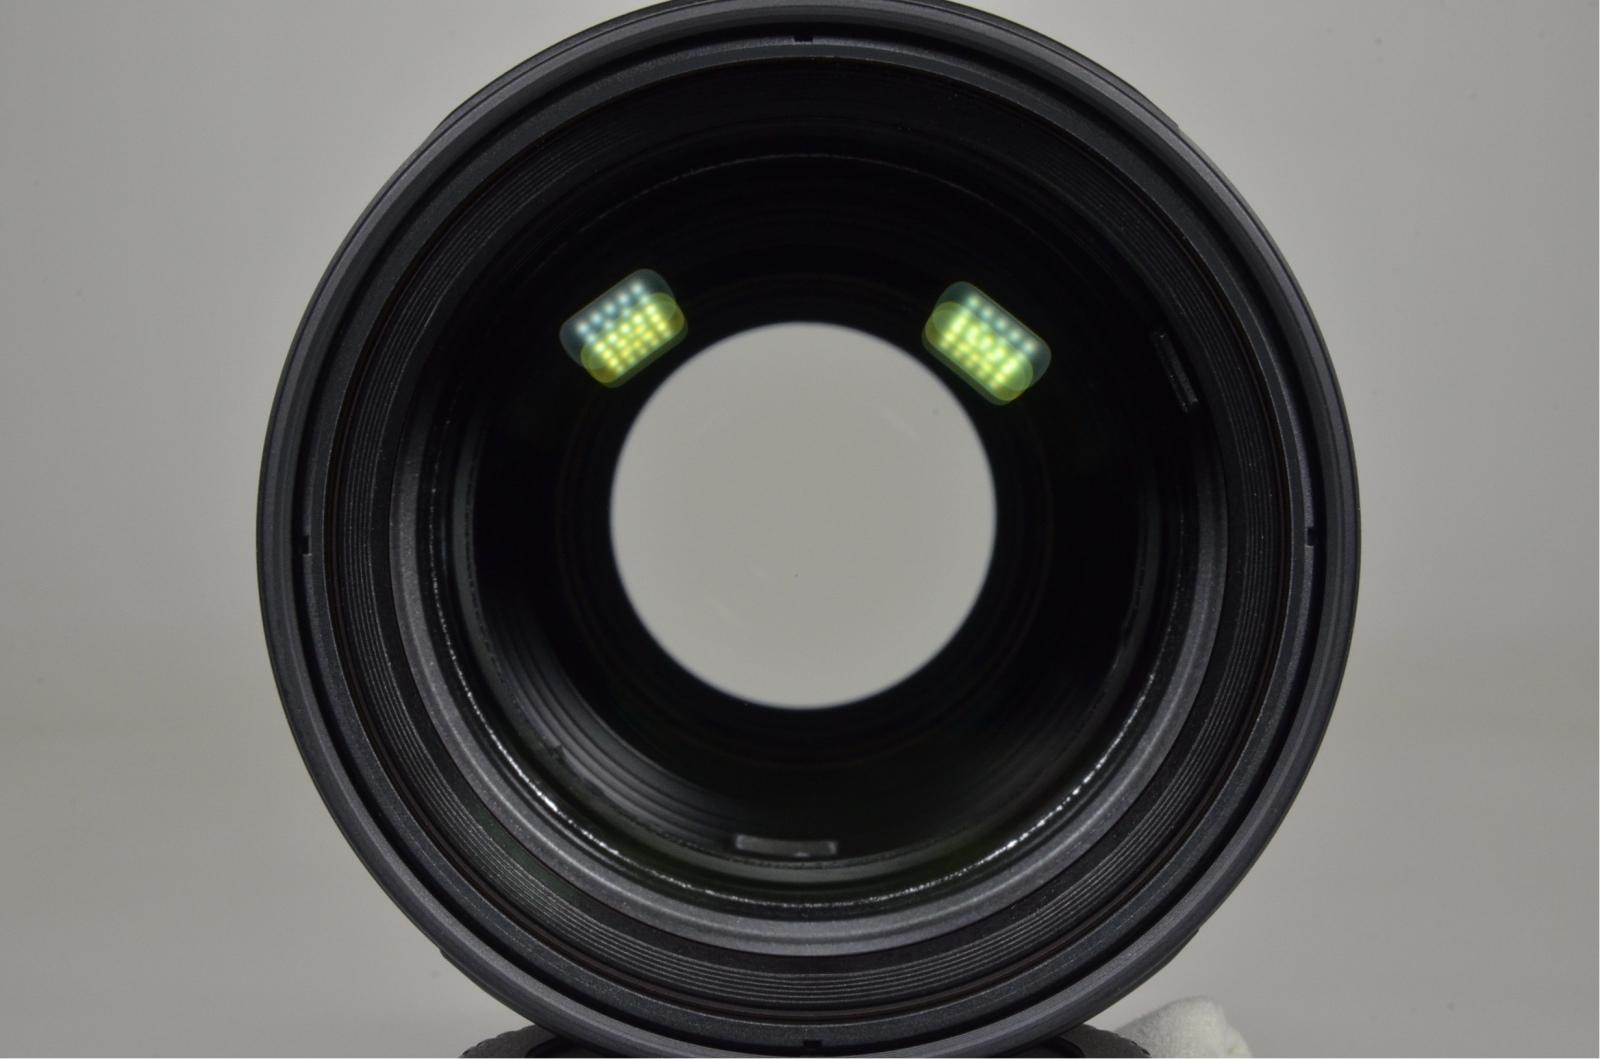 canon ef 70-200mm f/2.8 l usm ultrasonic lens with lenc case